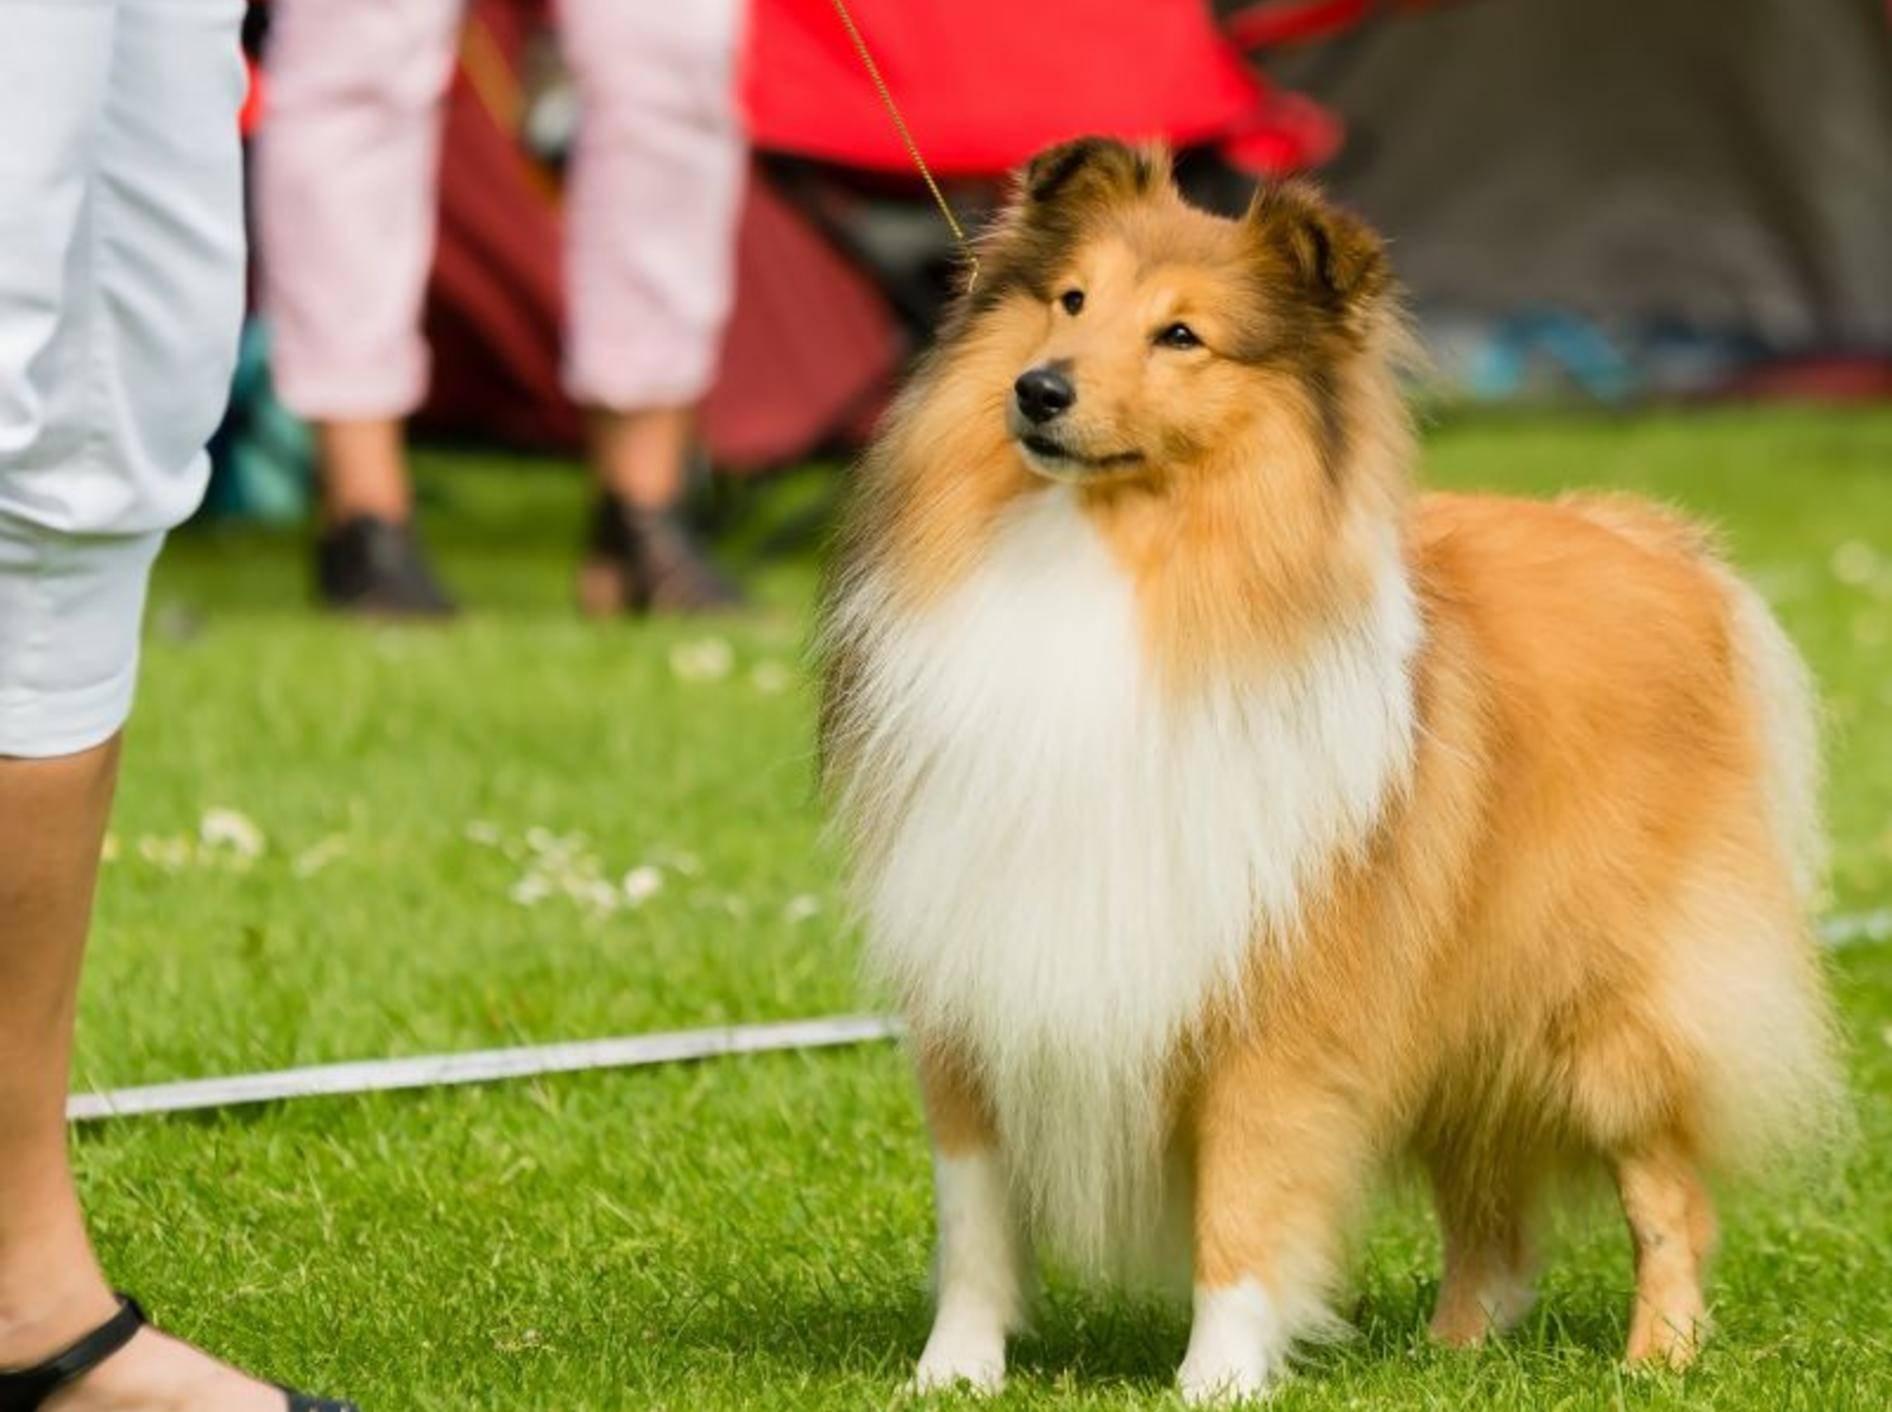 shetland-sheepdog-hund-shutterstock-Imfoto